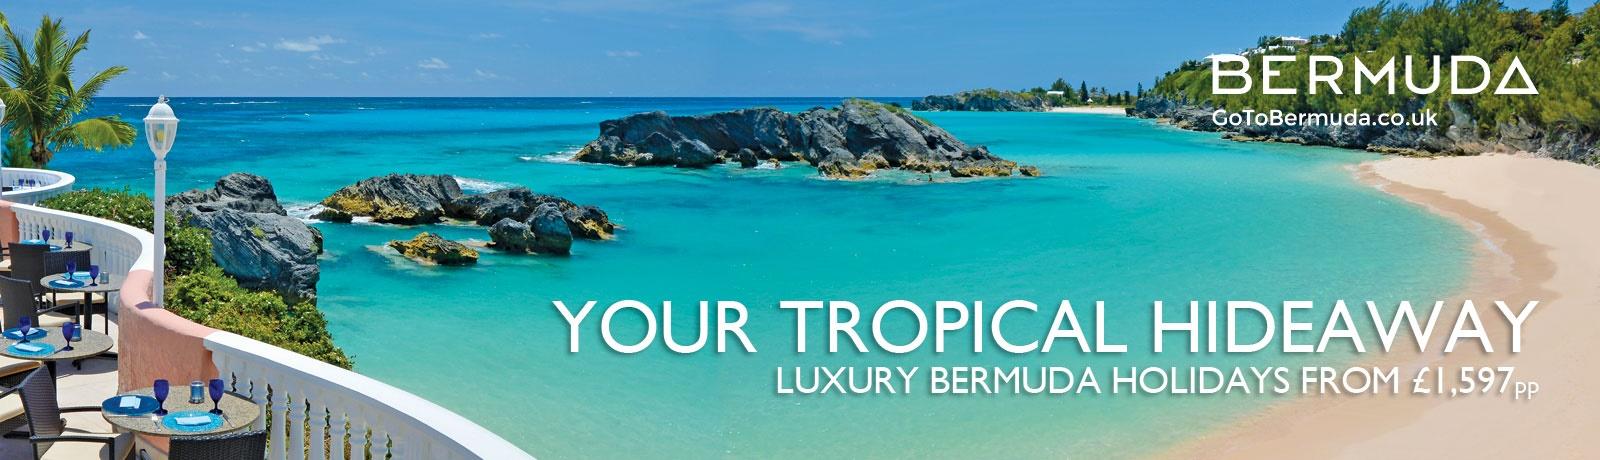 Bermuda: Your Tropical Hideaway